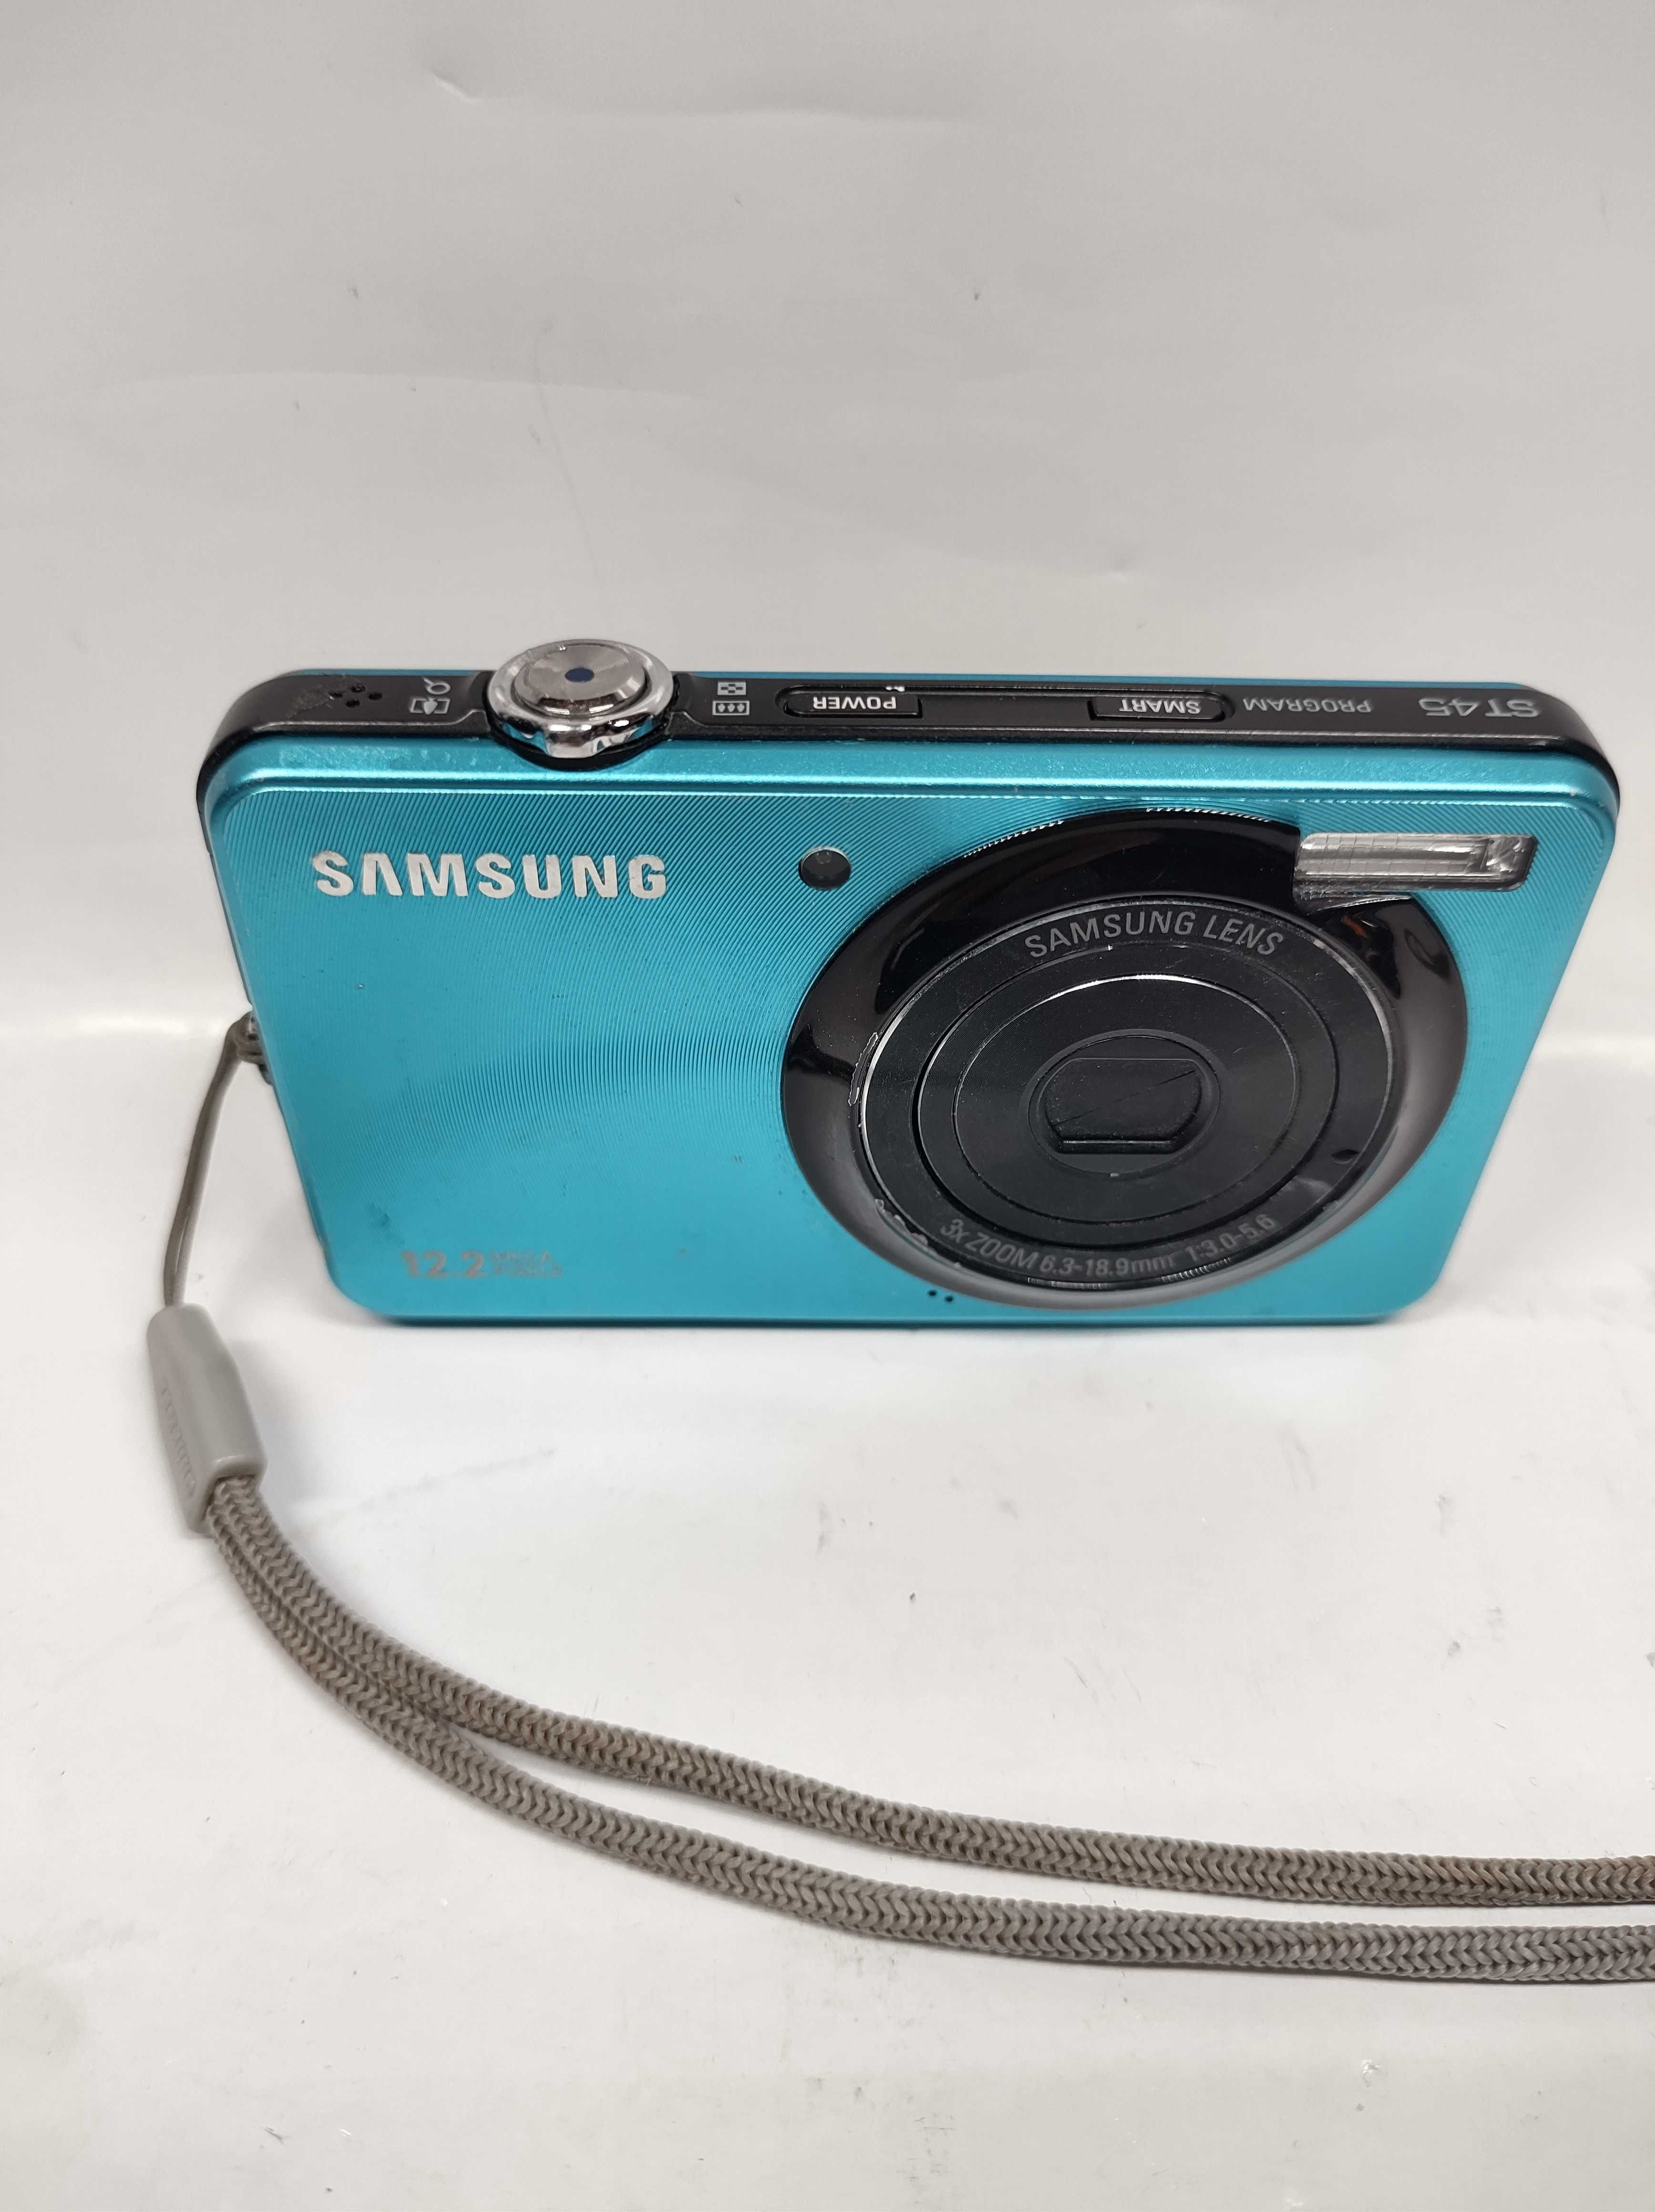 Aparat Fotograficzny Samsung ST45 (brak baterii) Lombard Dębica